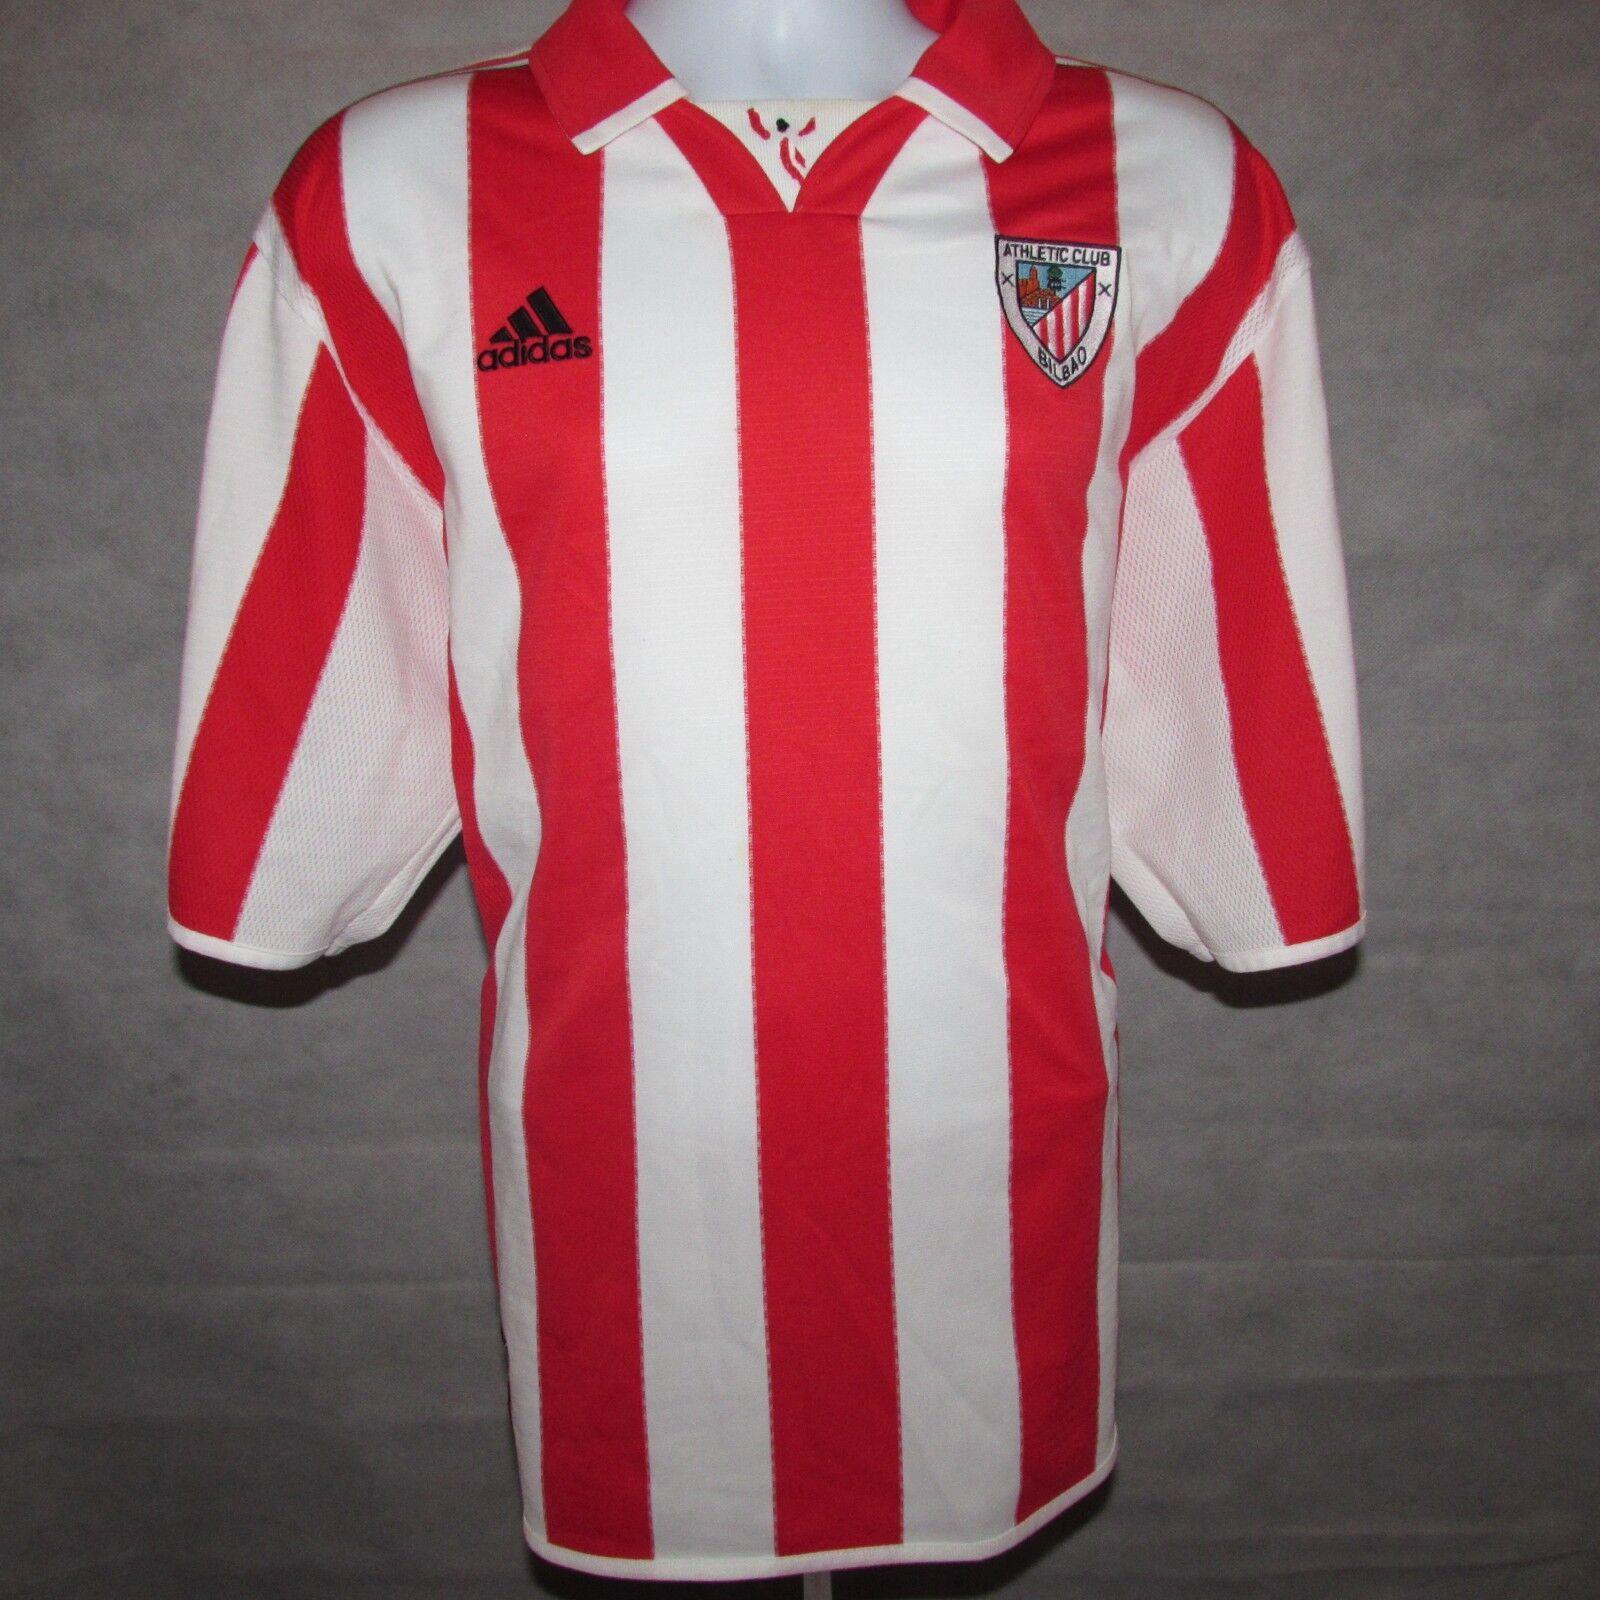 1999-2001 Athletic Bilbao Home Football Shirt, Adidas, XL (Excellent)